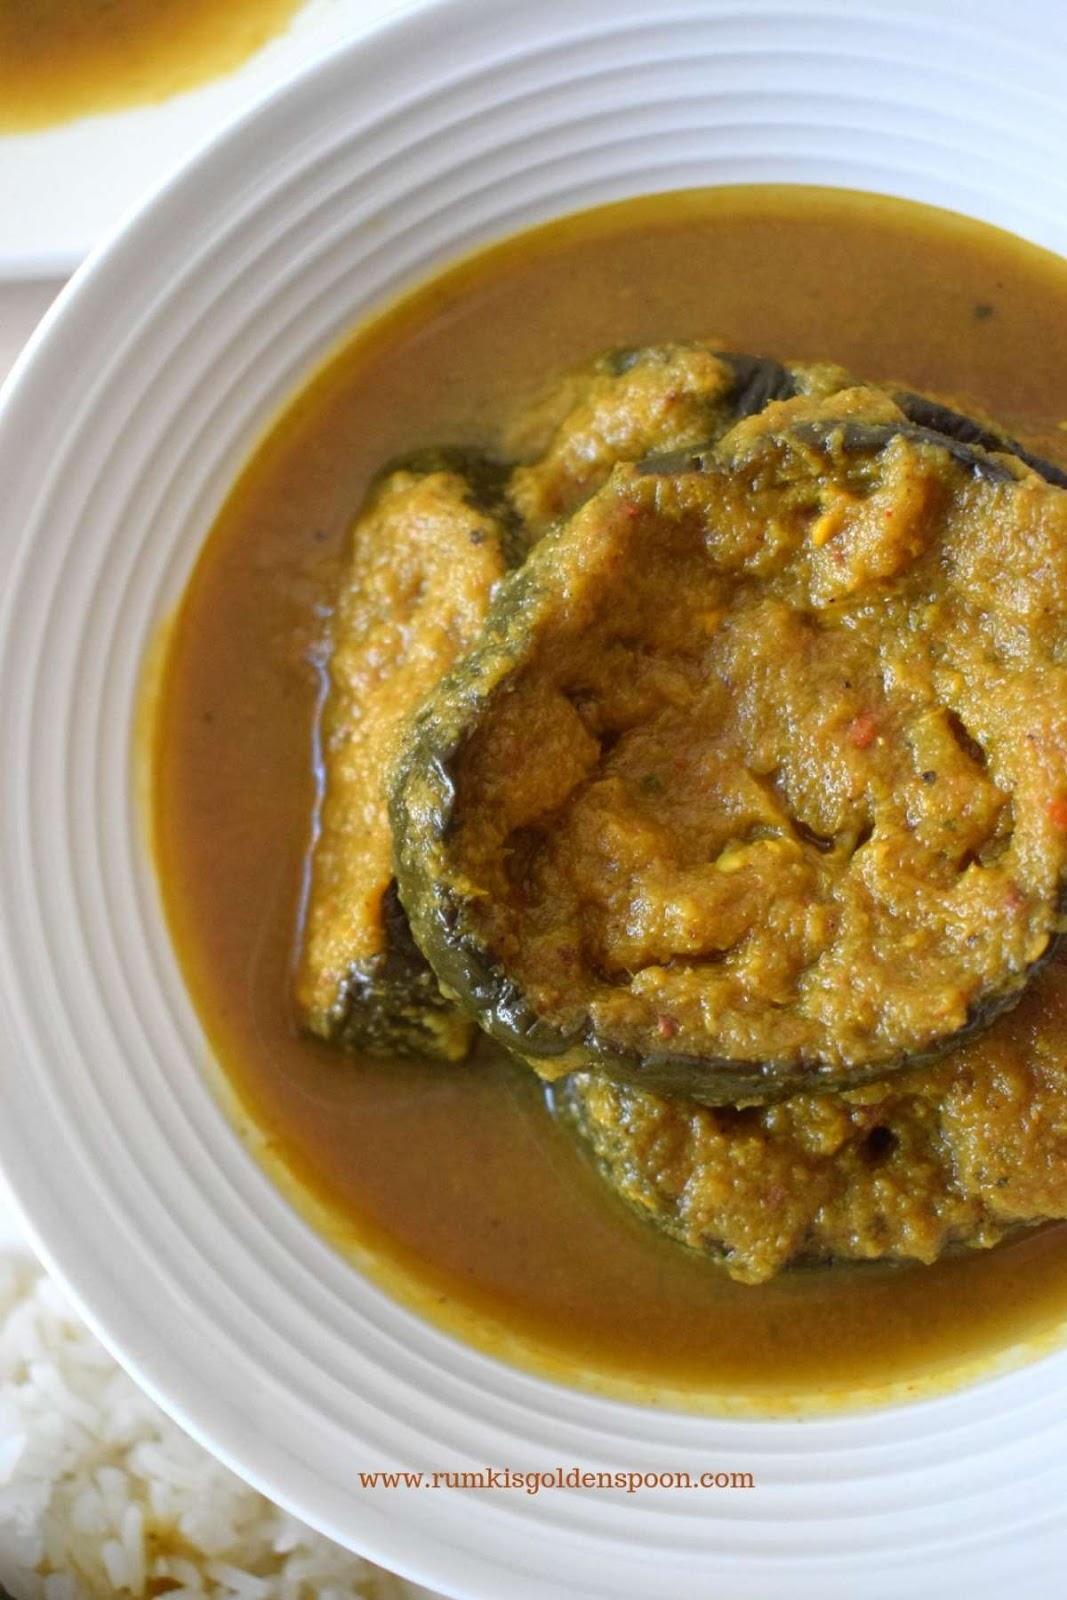 Baingan ki sabji, Baingan ki sabzi, eggplant vegetable recipes, aubergine curry recipes, brinjal curry, Indian curry recipes, Indian recipe, Vegetarian recipe, Vegan recipe, Quick and Easy recipe, Rumki's Golden Spoon